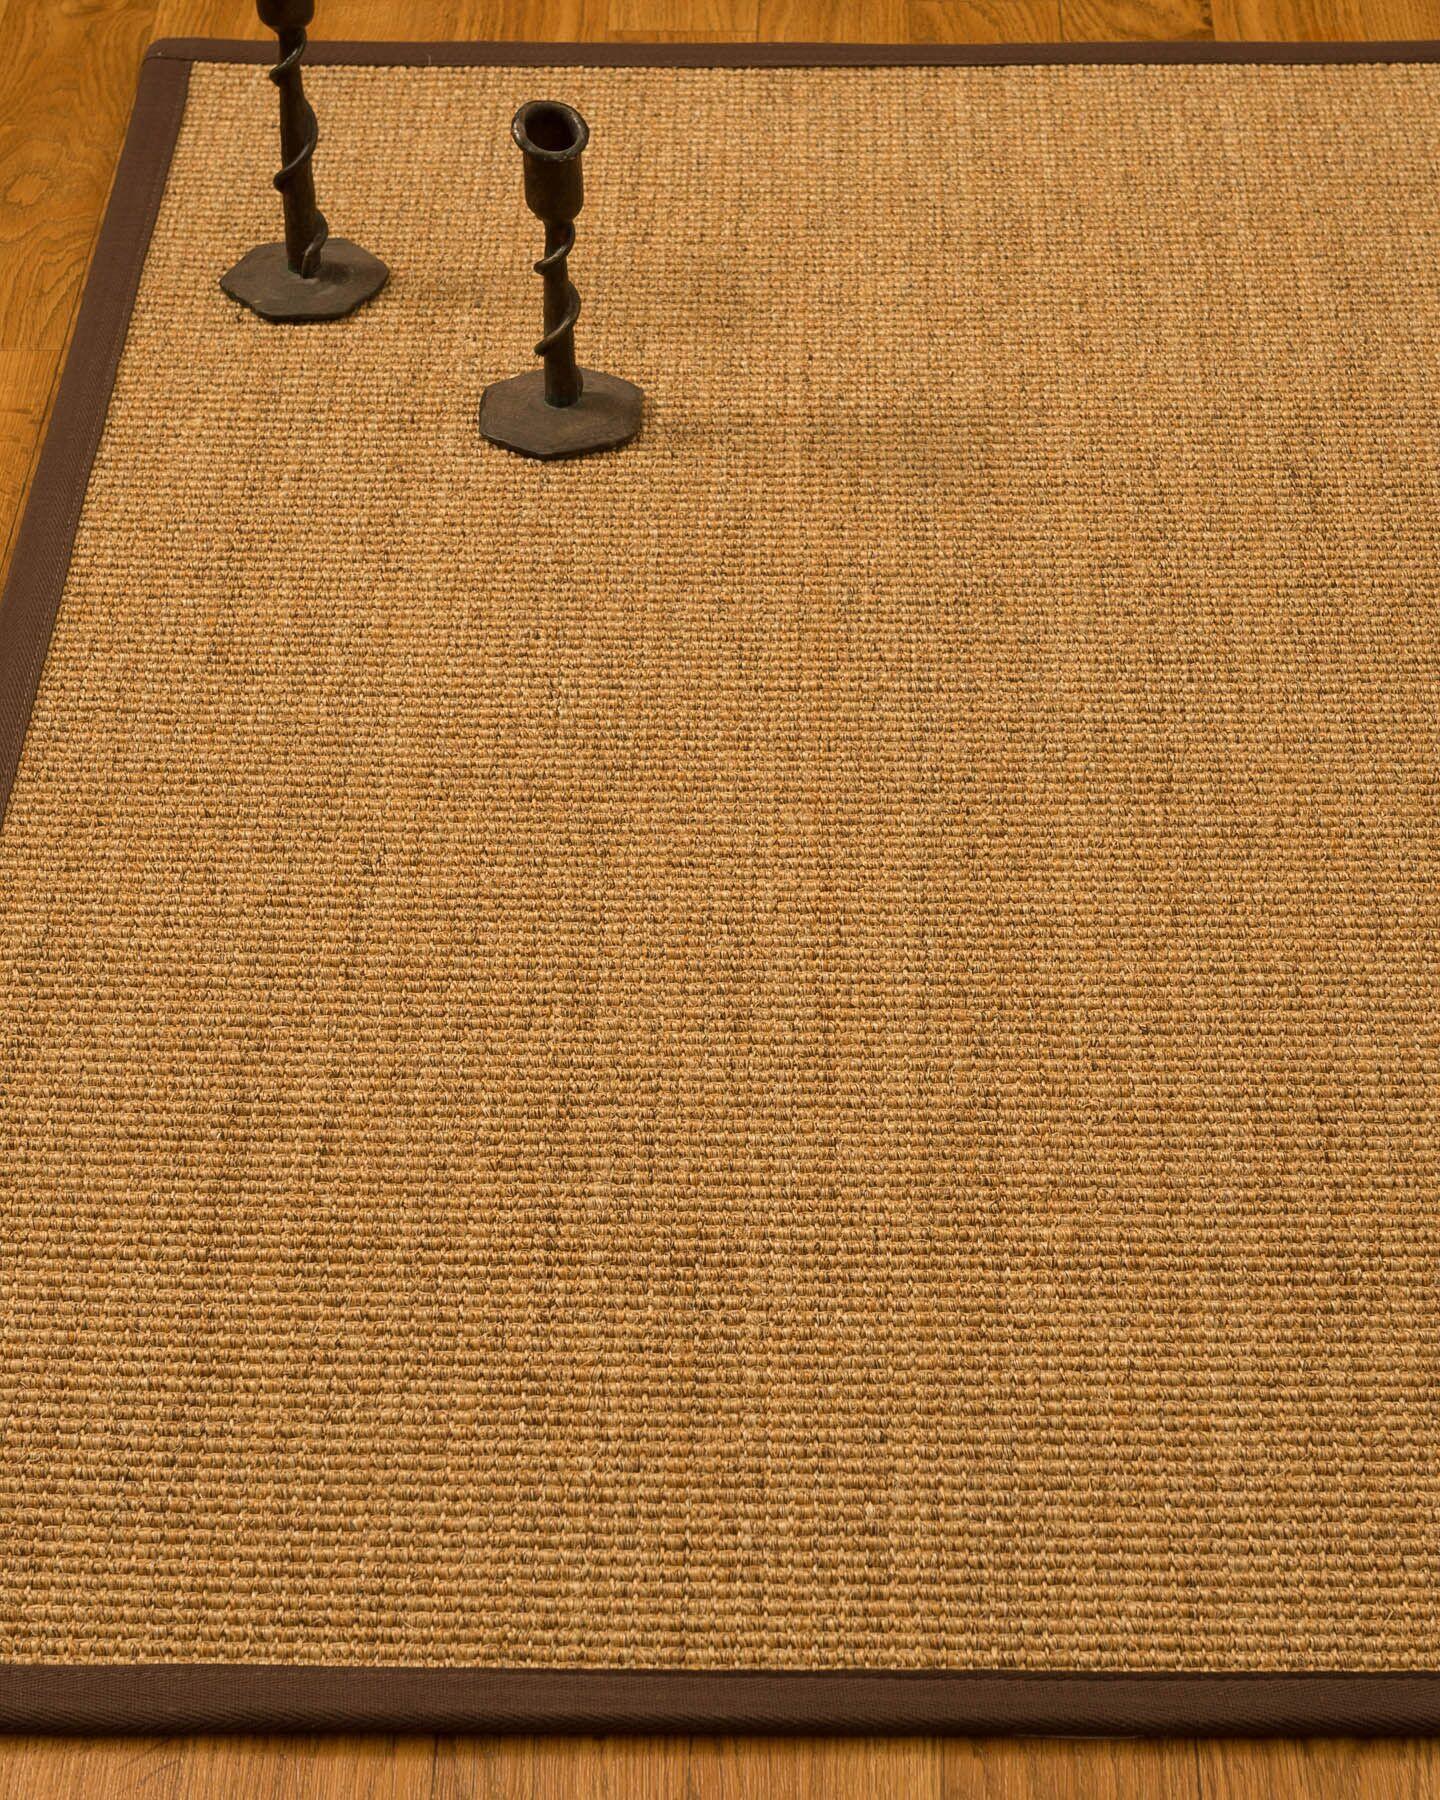 Escalante Handwoven Beige Area Rug Rug Size: Rectangle 8' x 10'